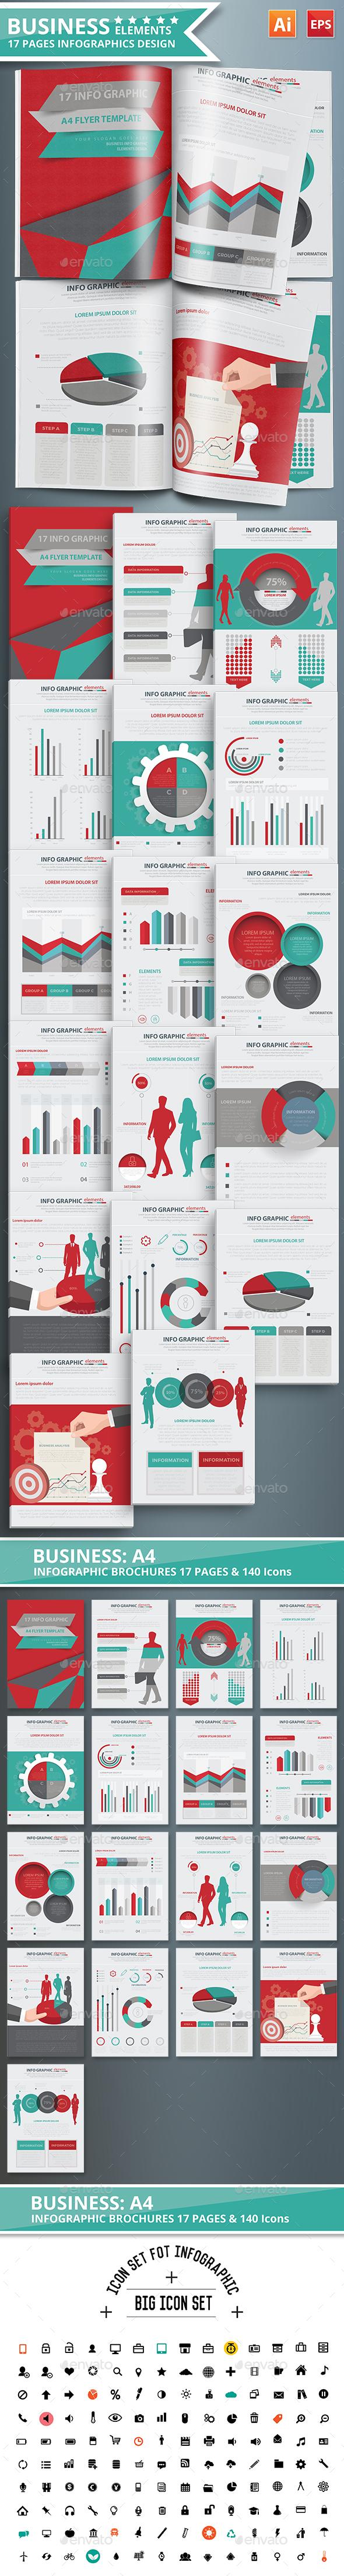 Business Infographic Design Scheme 02 - Infographics